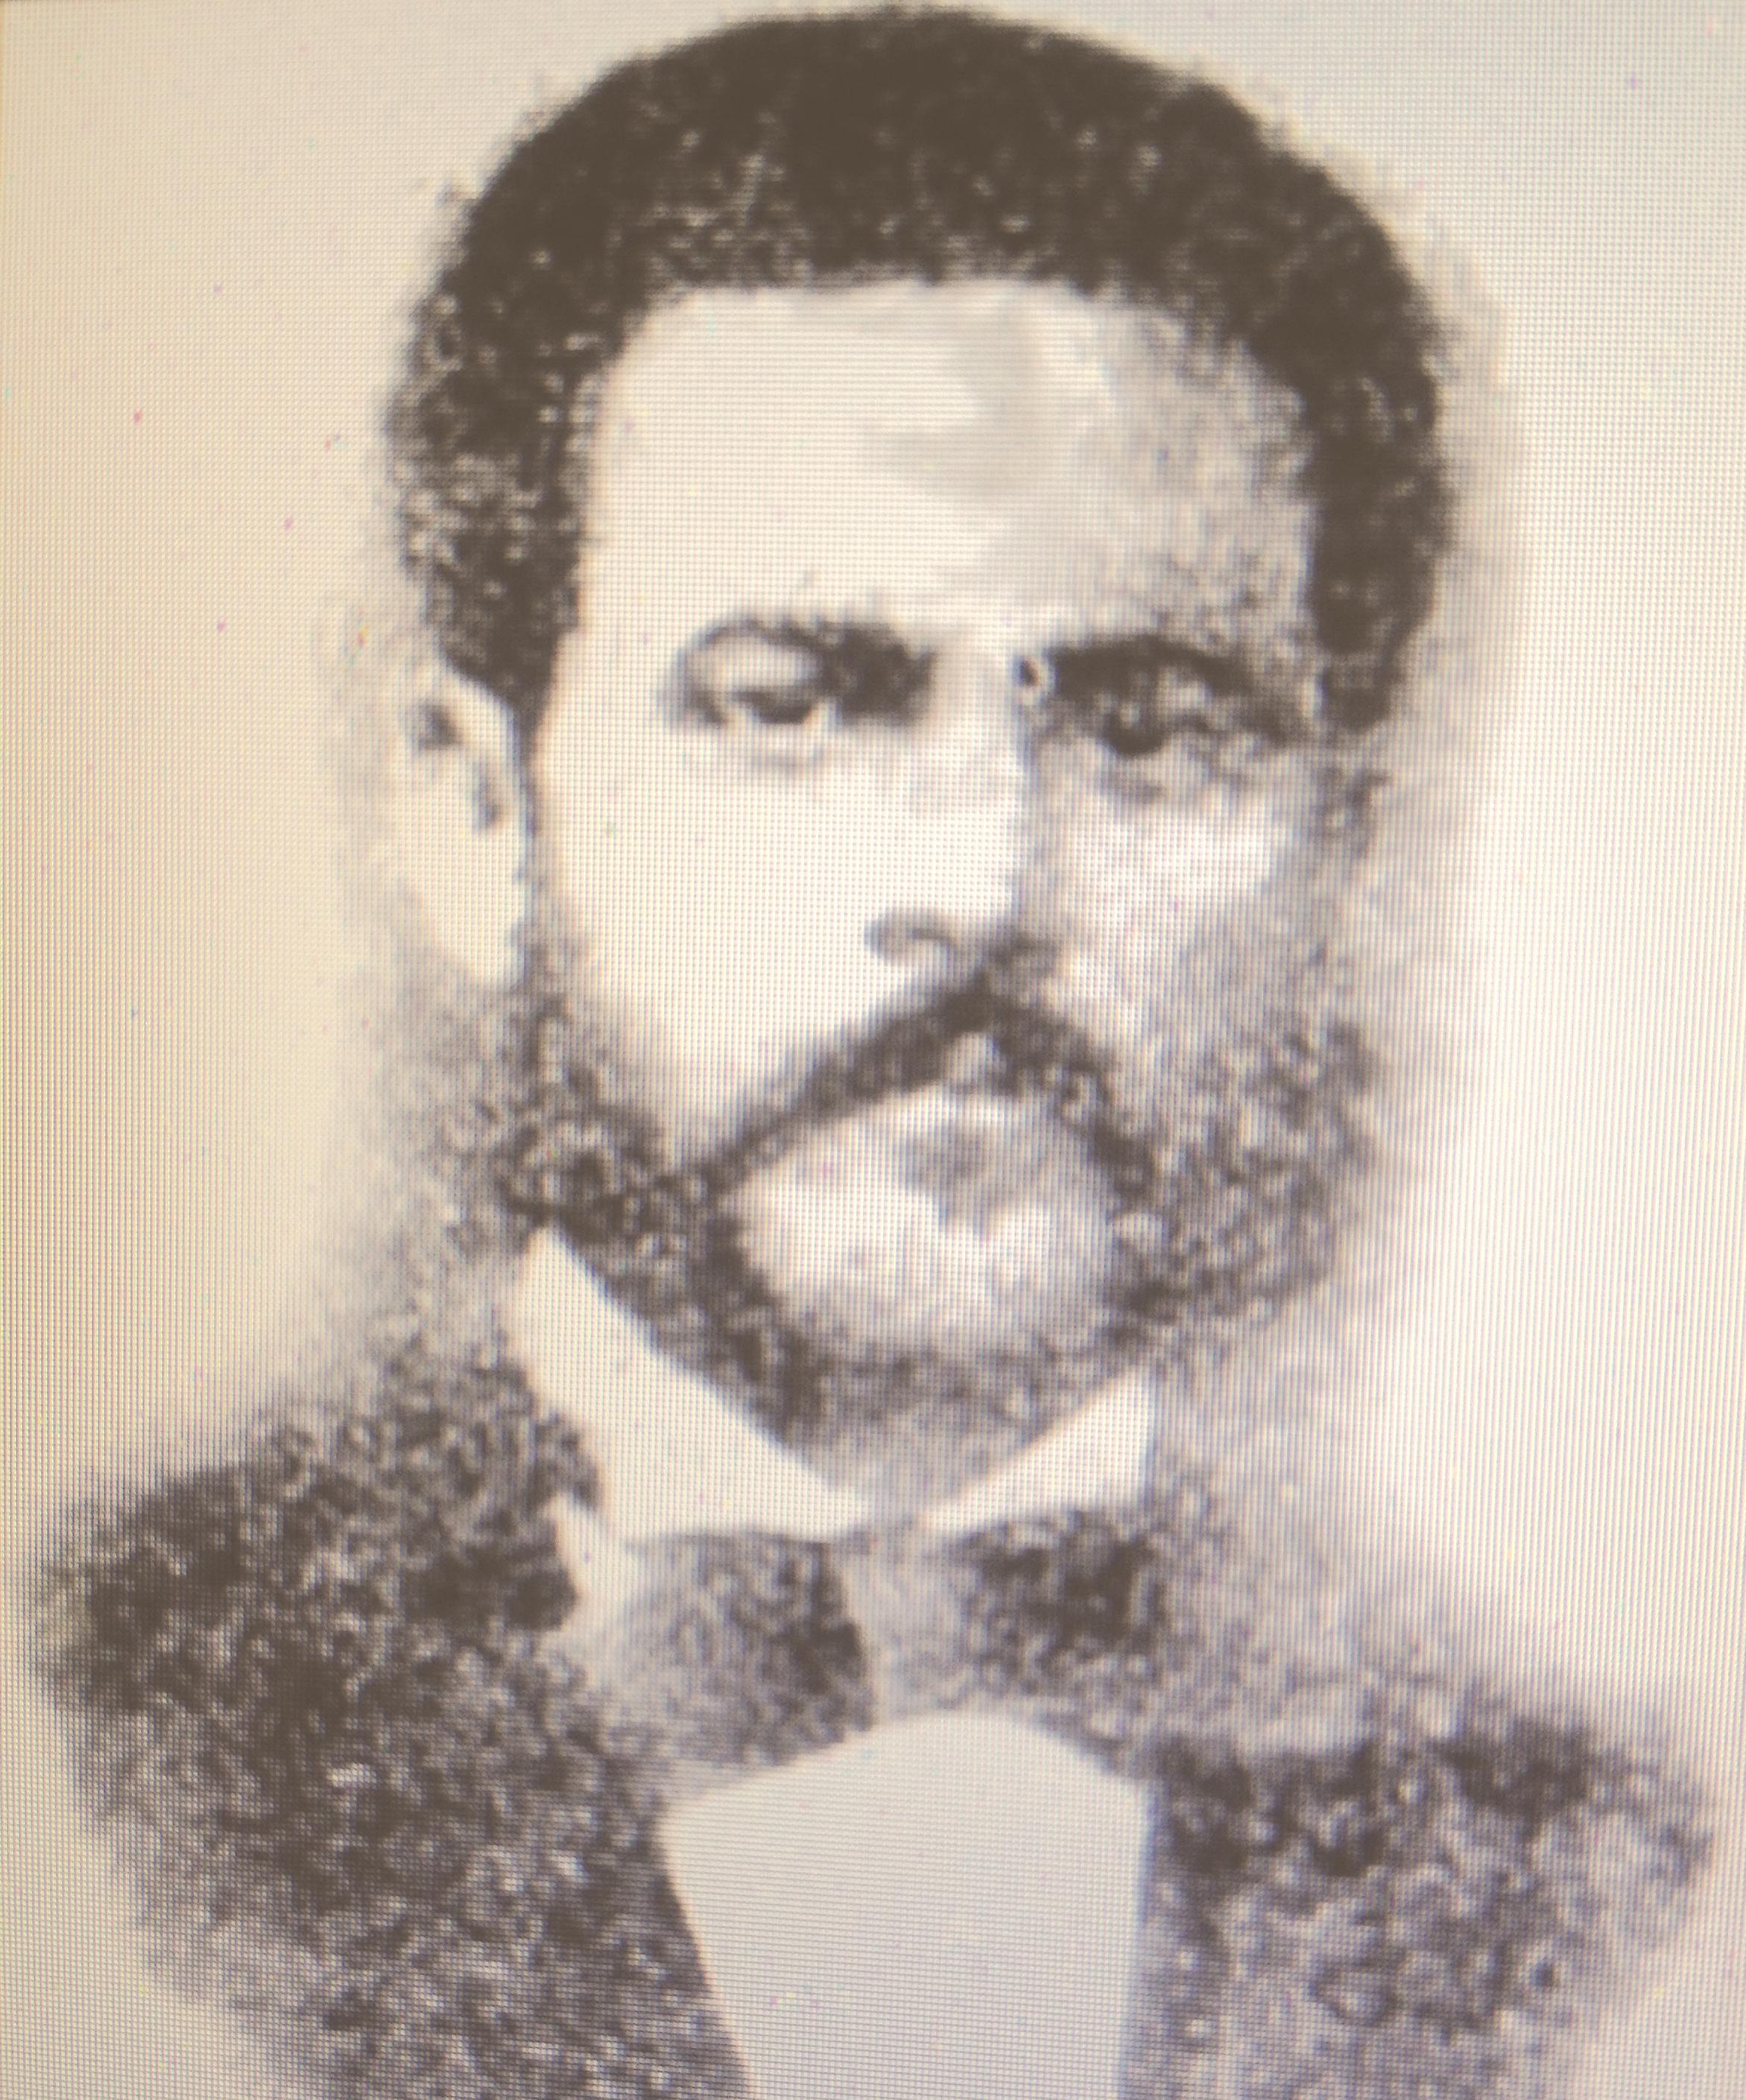 Alvaro Contreras